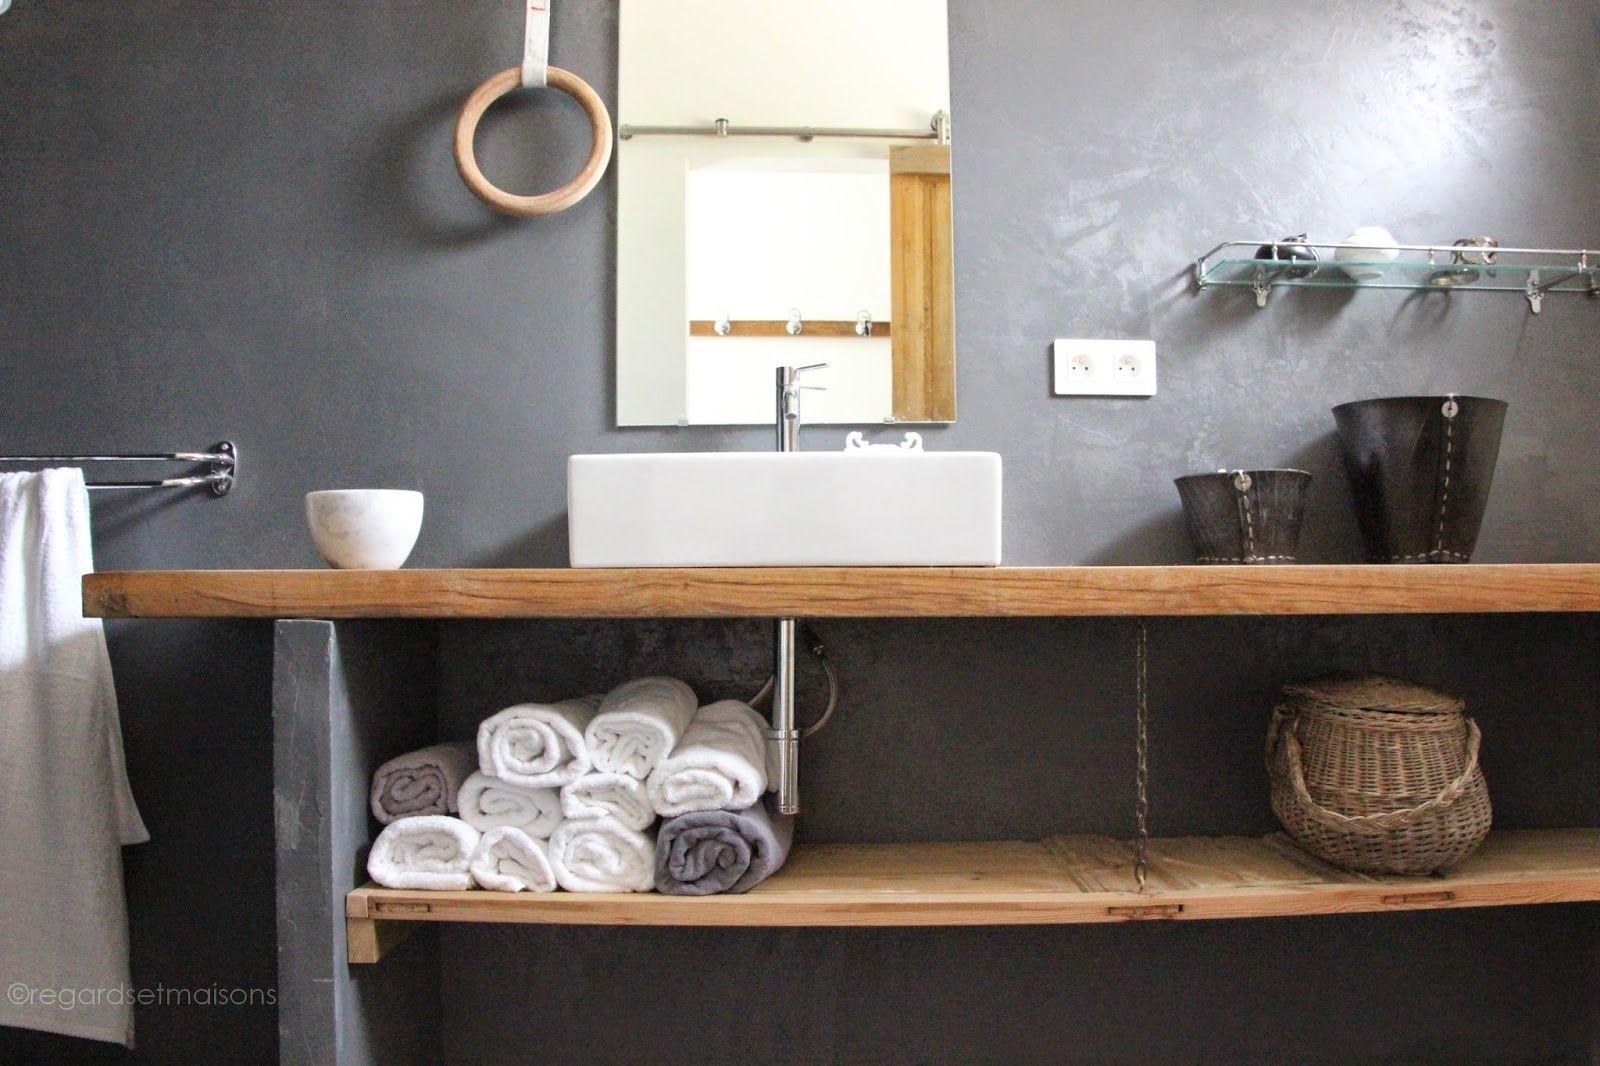 Salle de bains, google and entreprise on pinterest